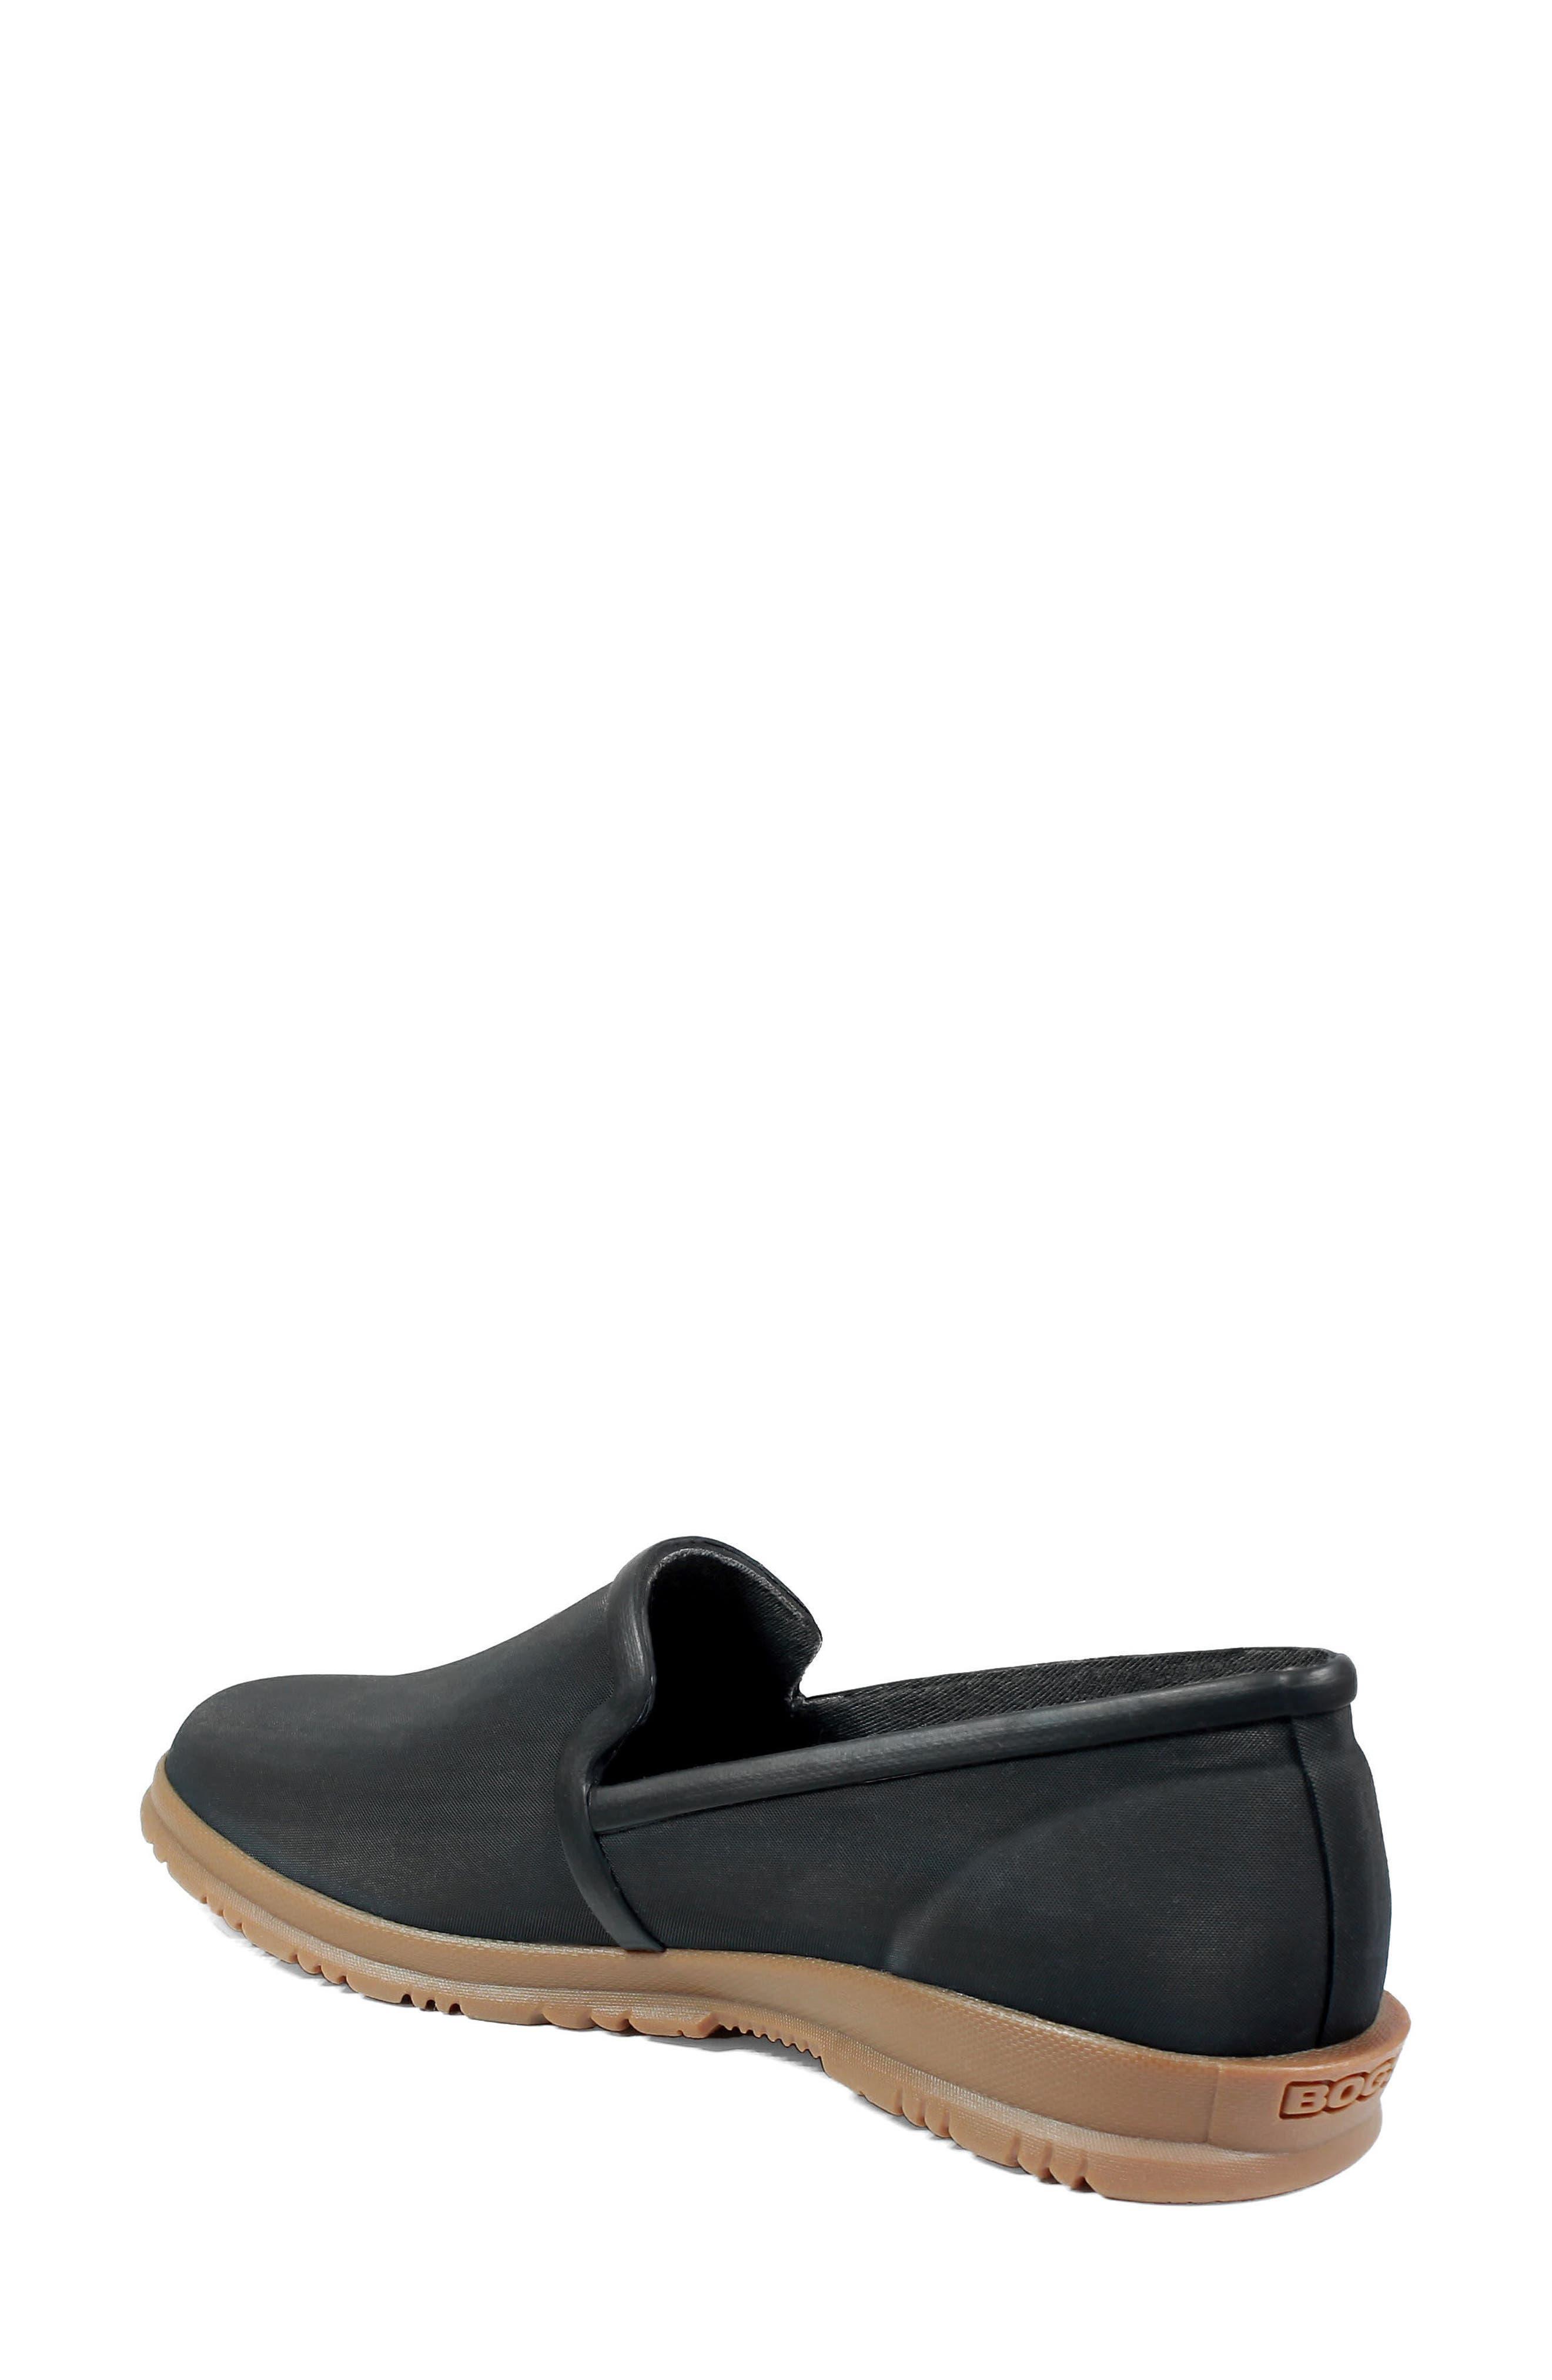 BOGS, Sweetpea Waterproof Slip-On Sneaker, Alternate thumbnail 2, color, 001